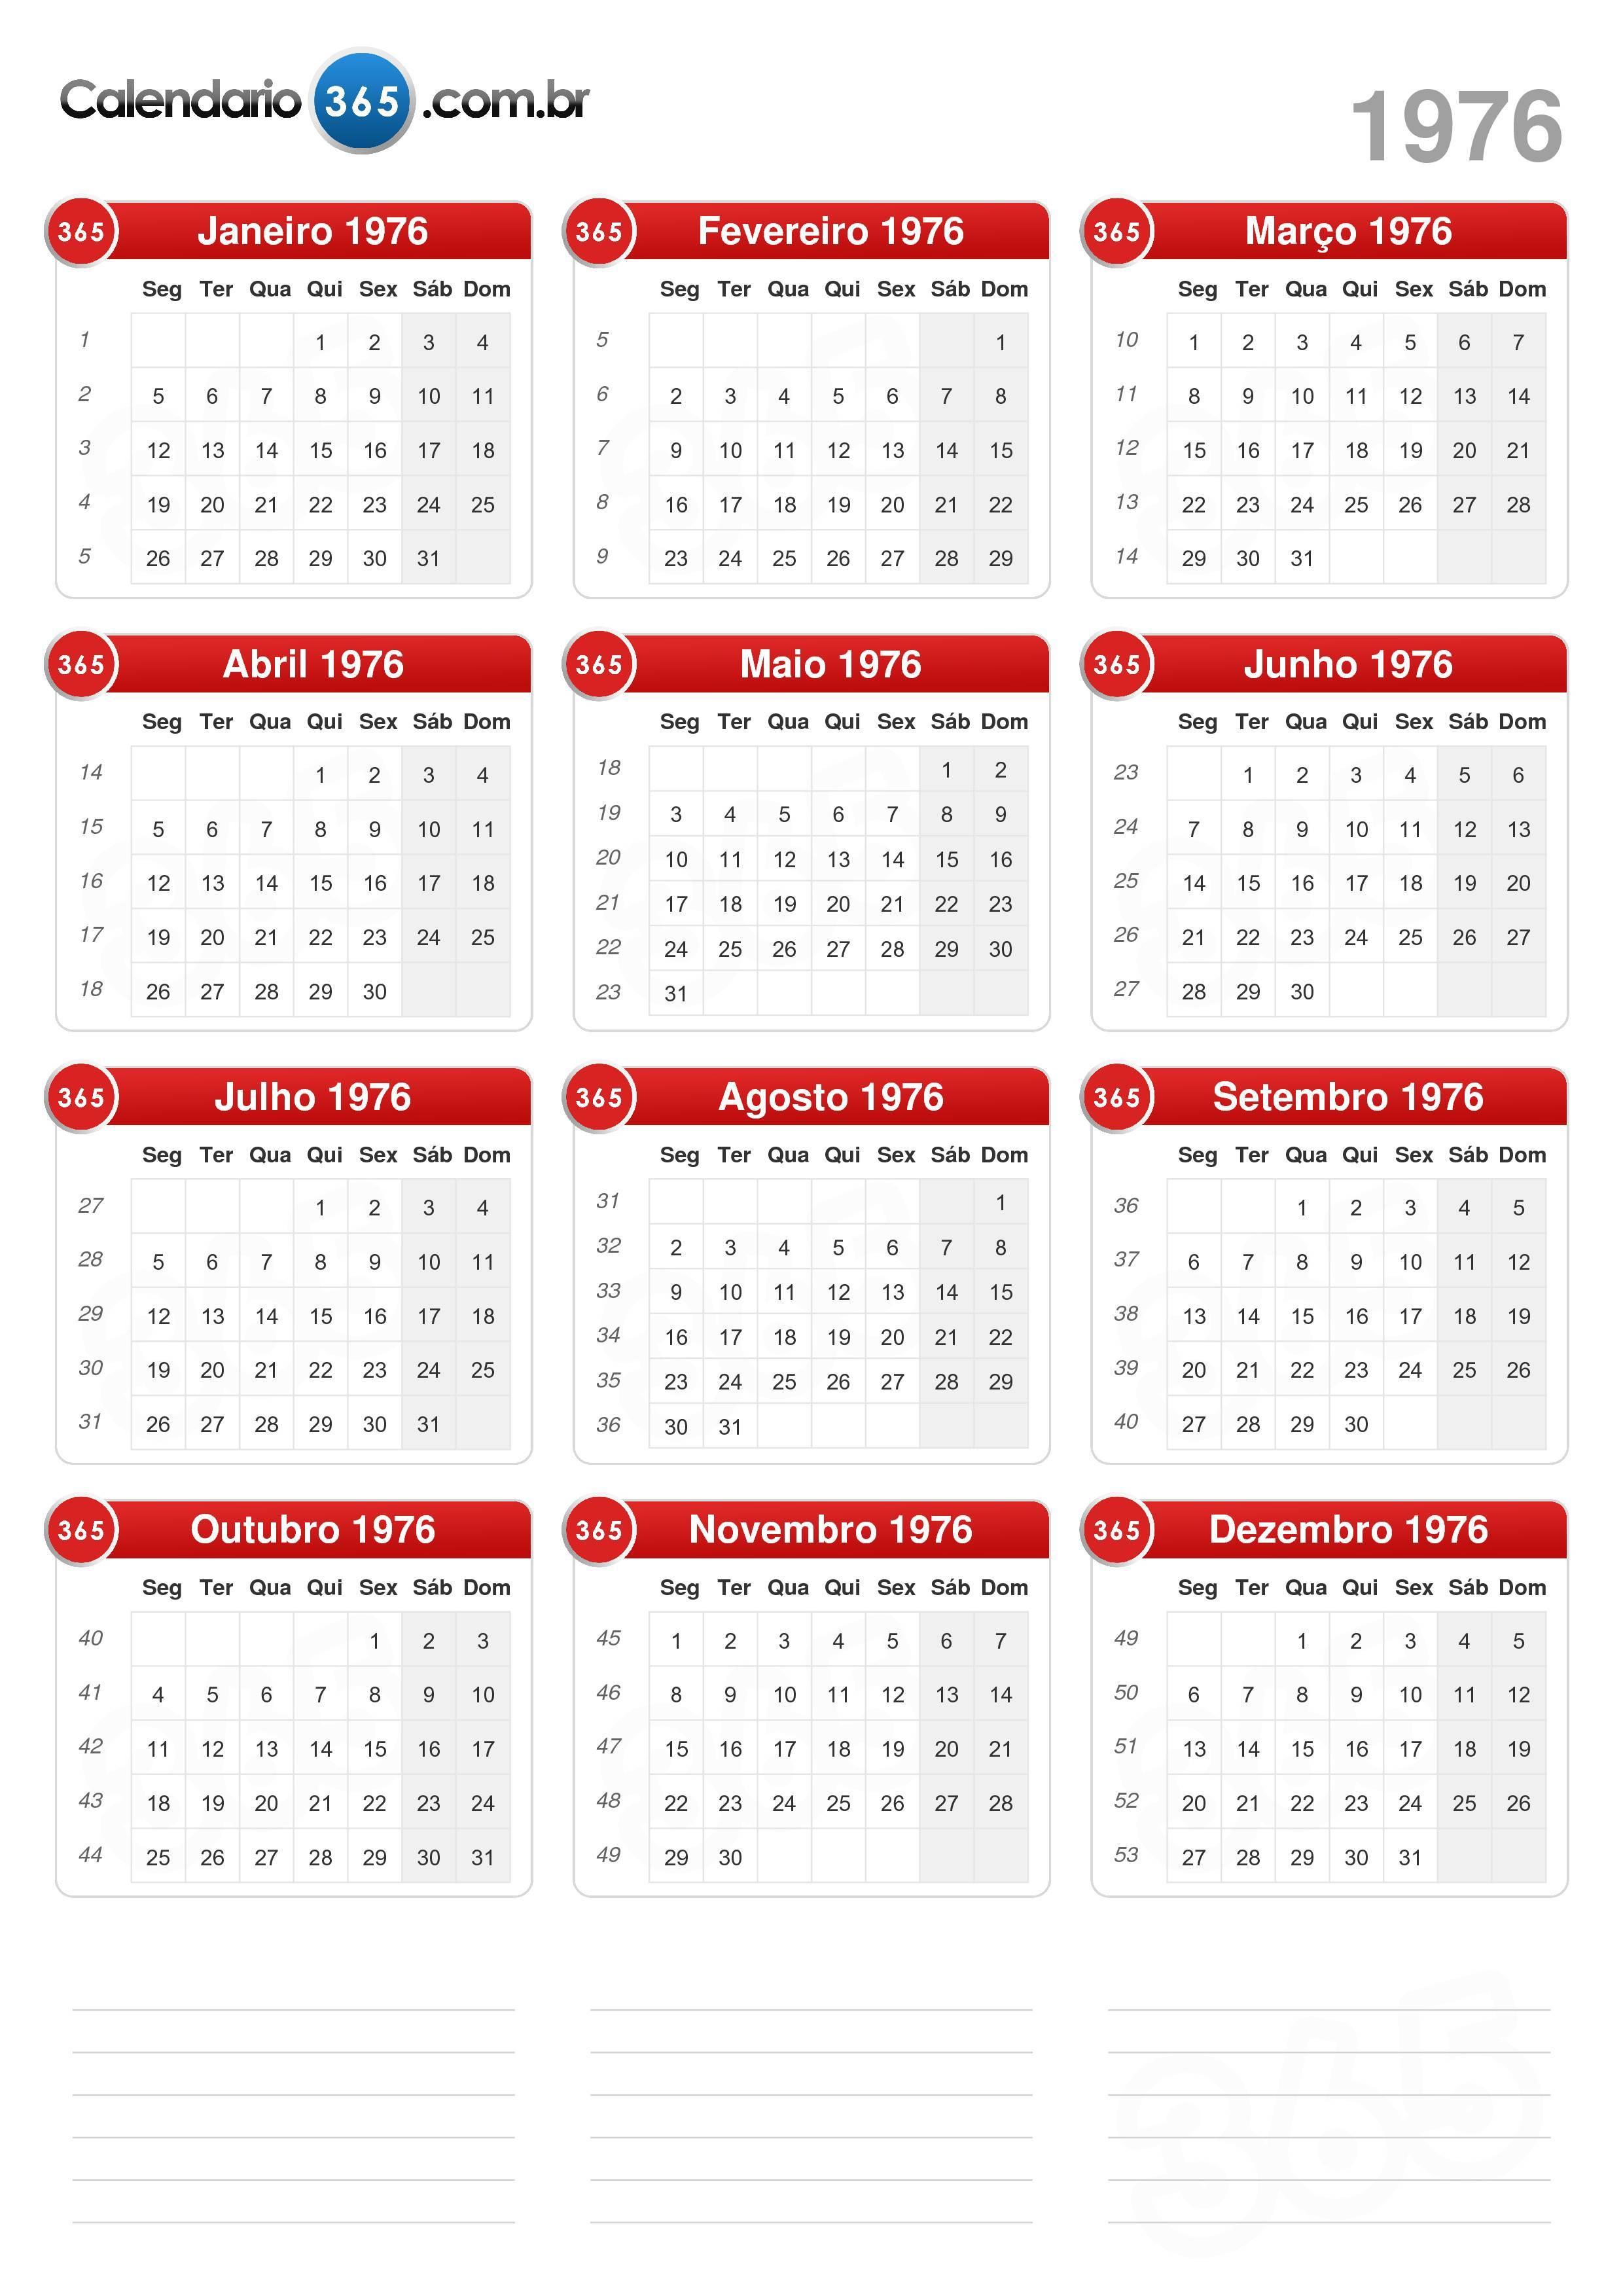 Calendario 1976.Calendario 1976 Calendario 2020